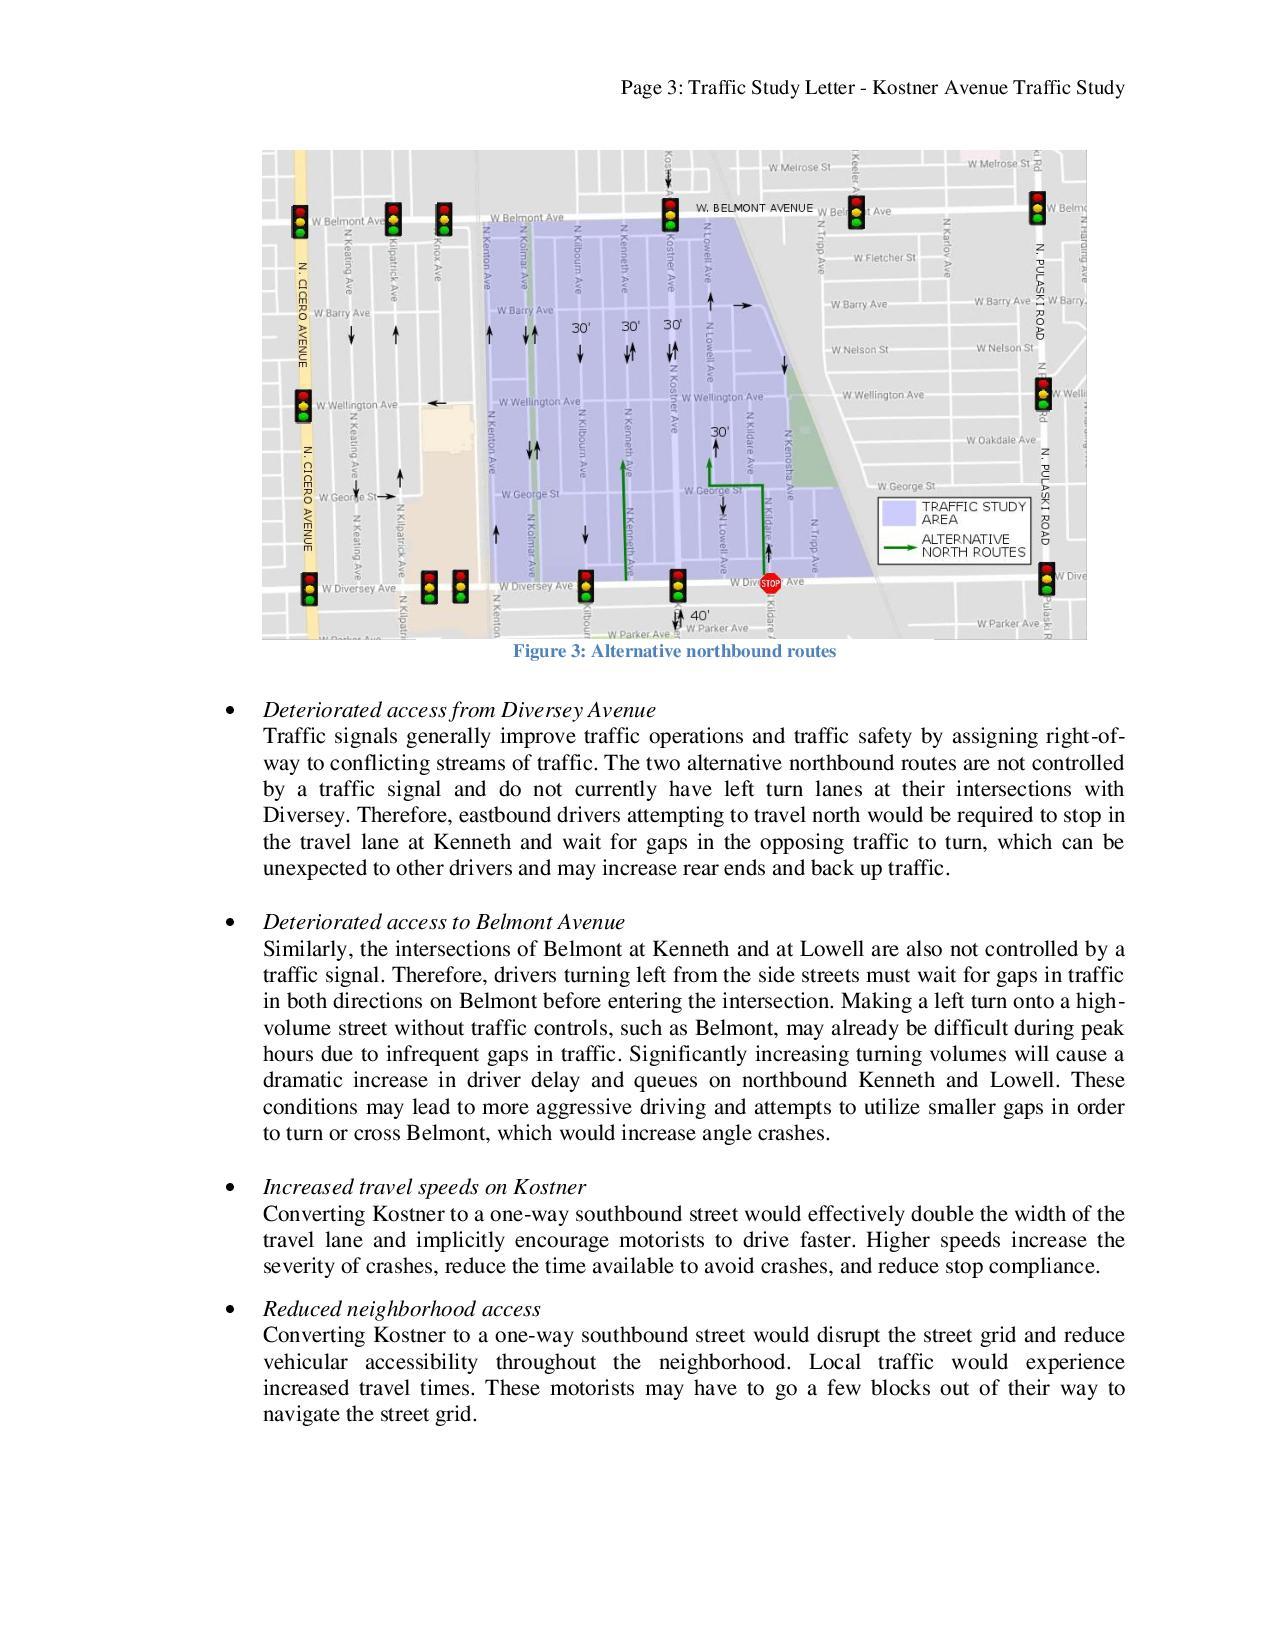 Kostner_Avenue_Traffic_Study_Letter-page-003.jpg